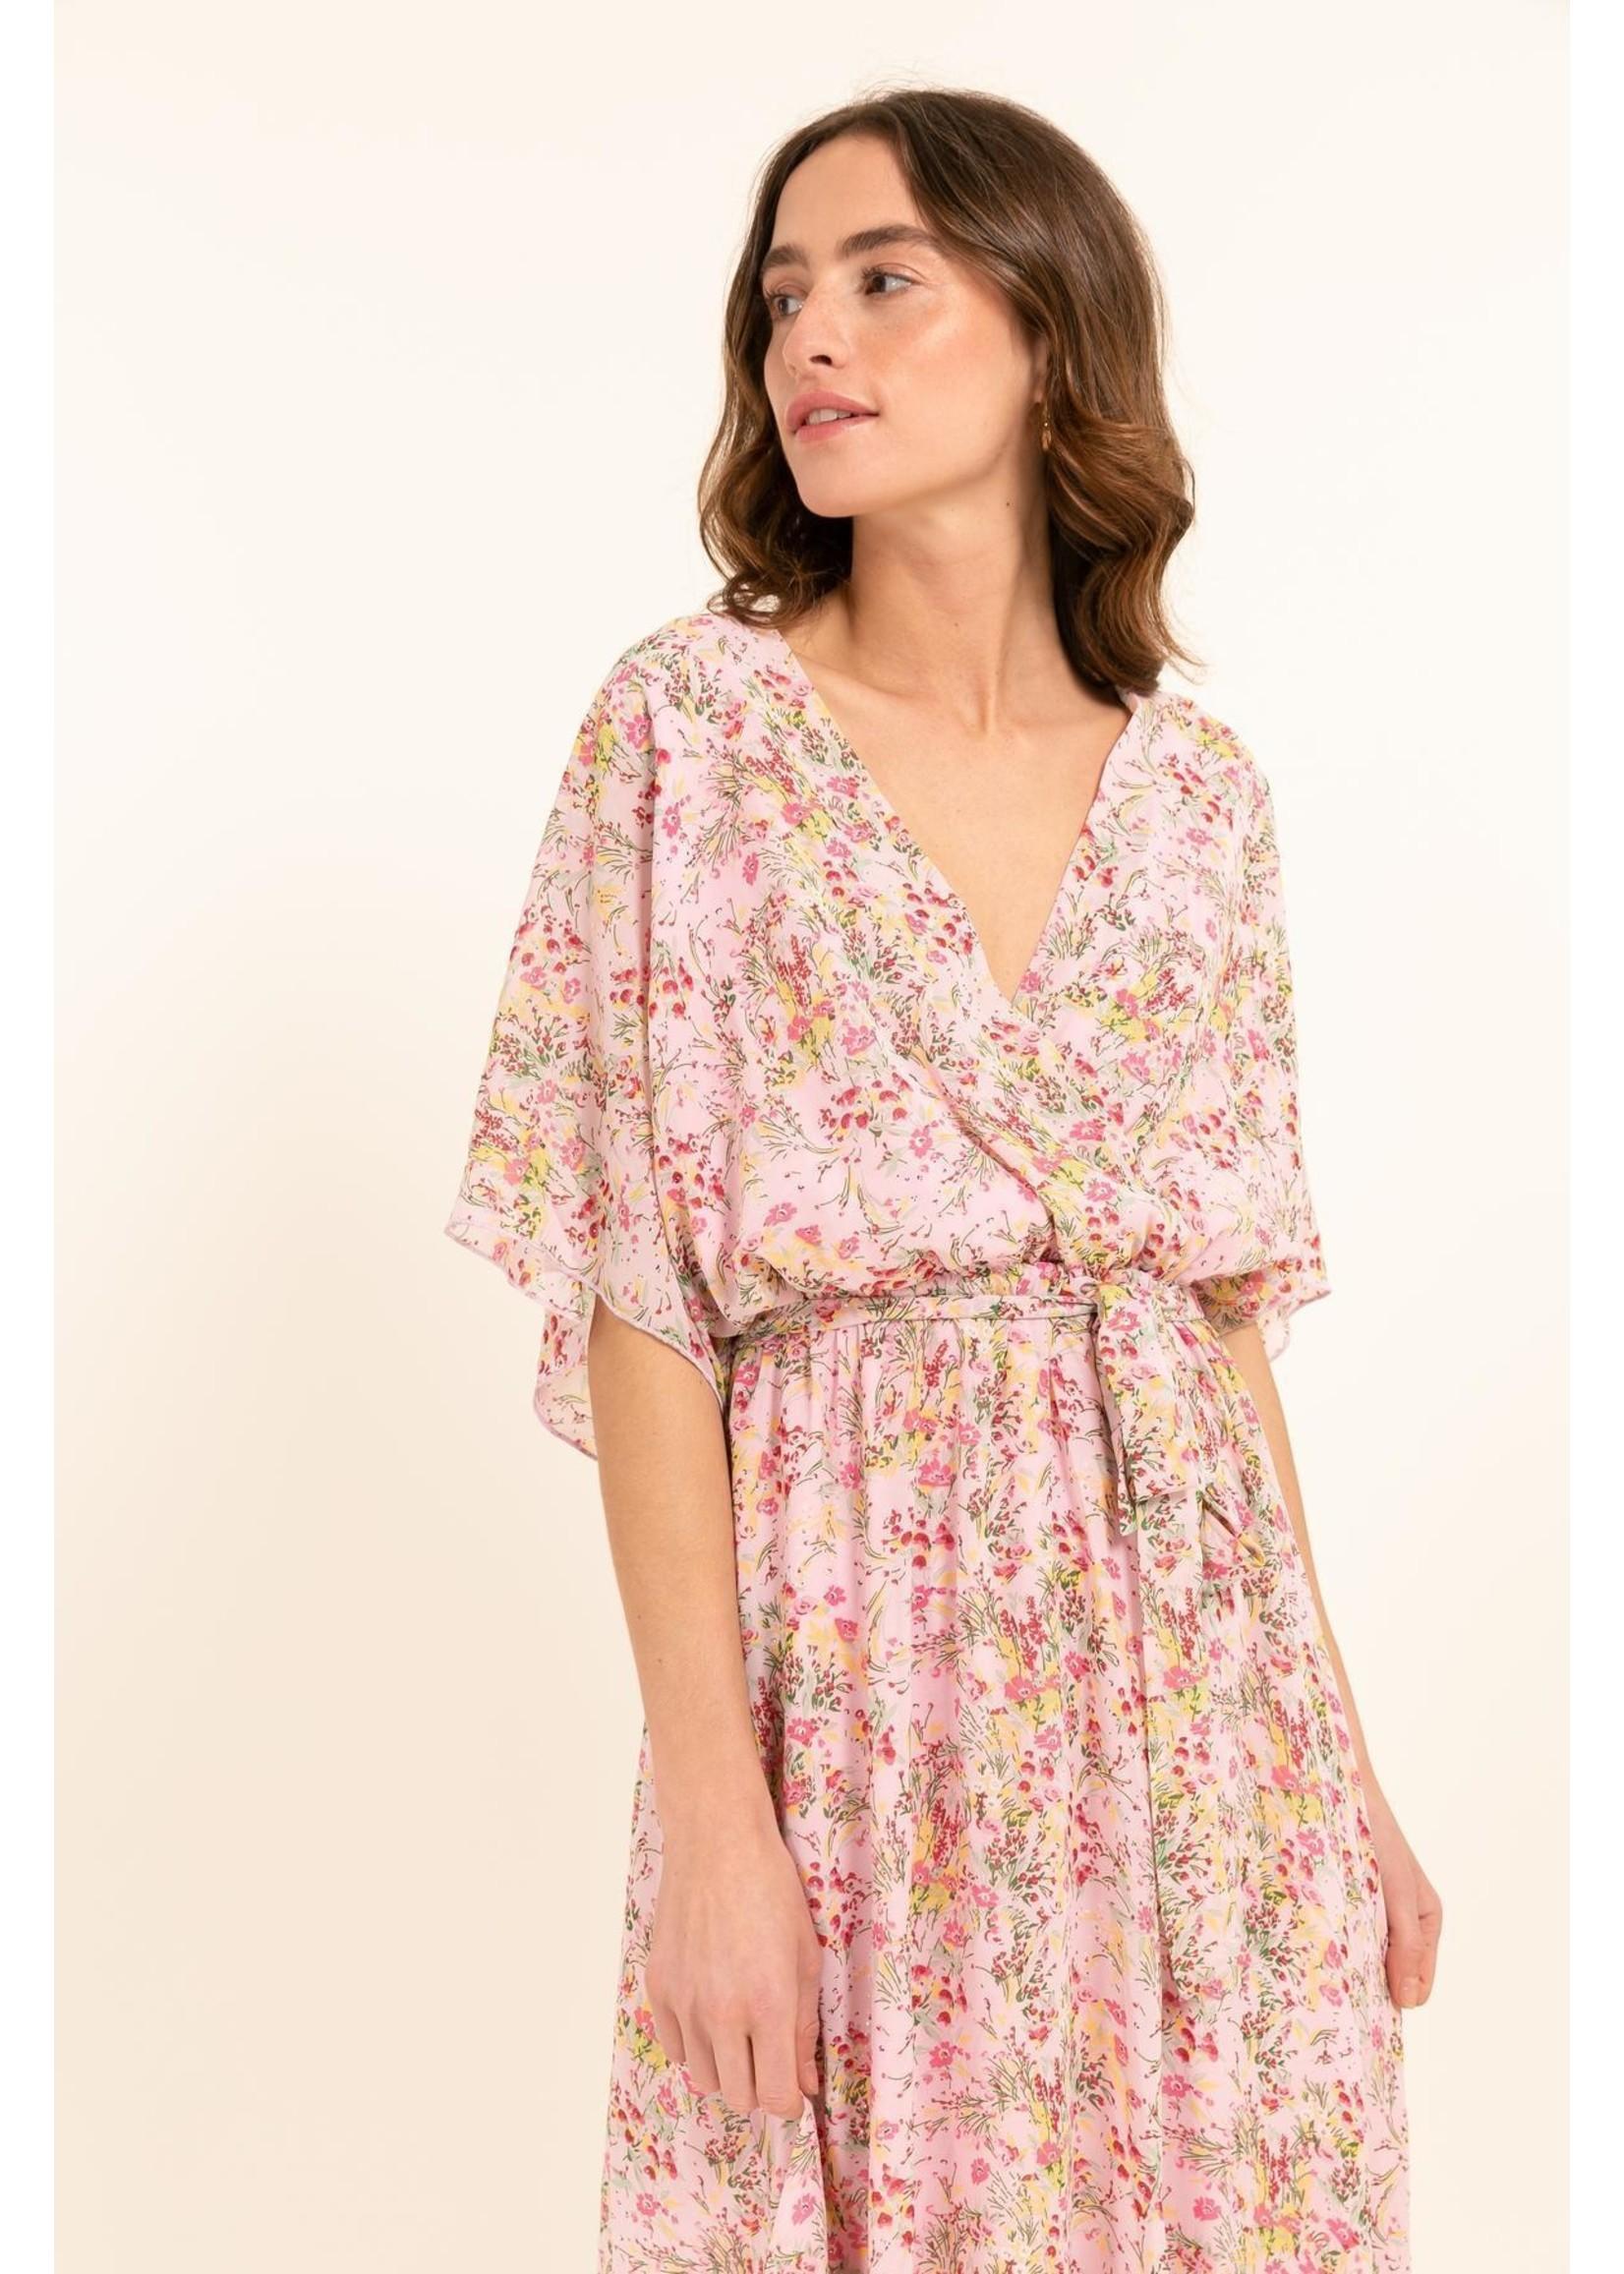 Cherry Paris Officiel Cherry pink flower dress